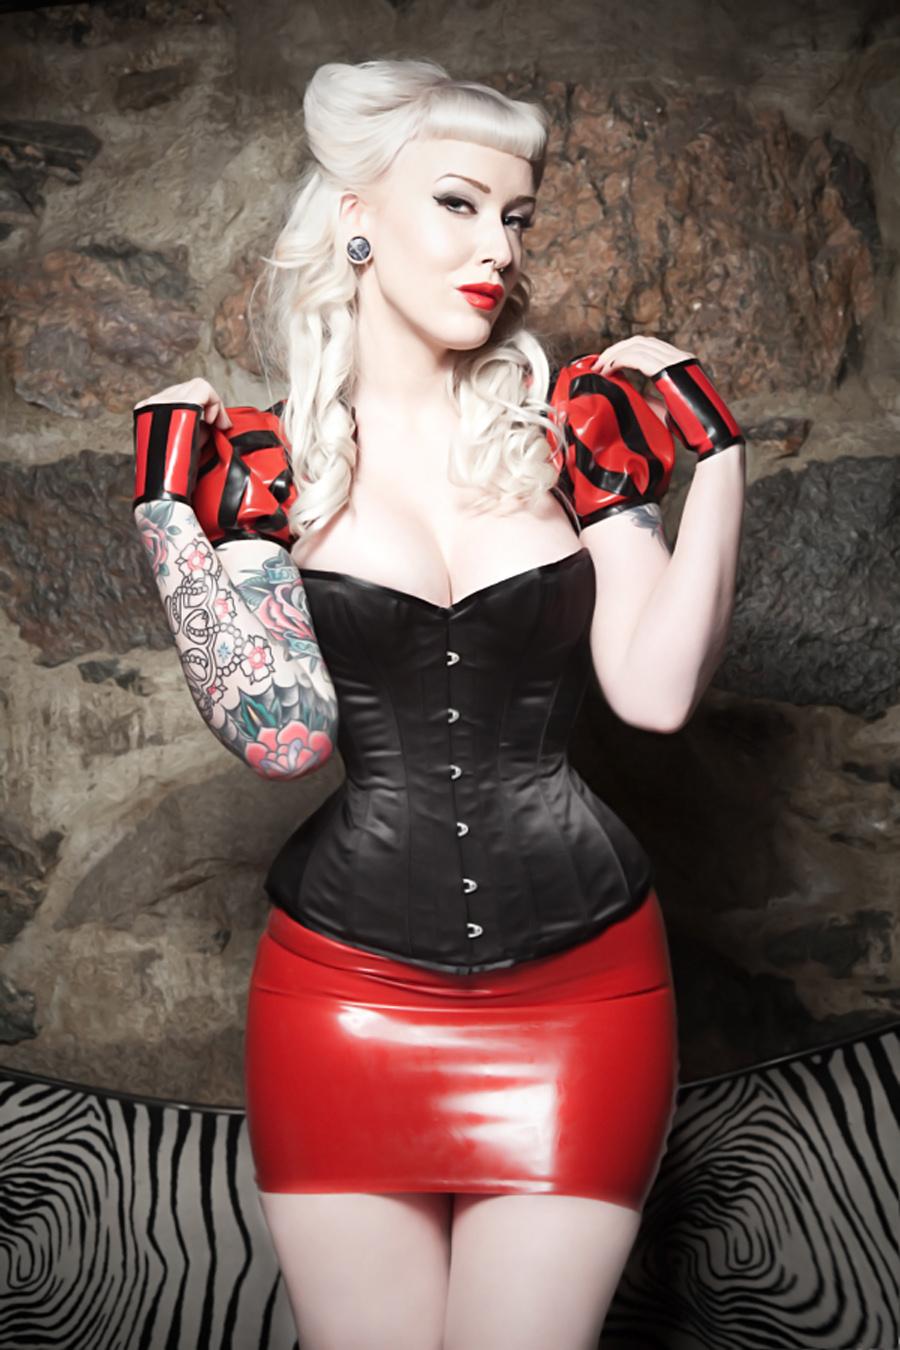 sexy+tight+corset+(1).jpg